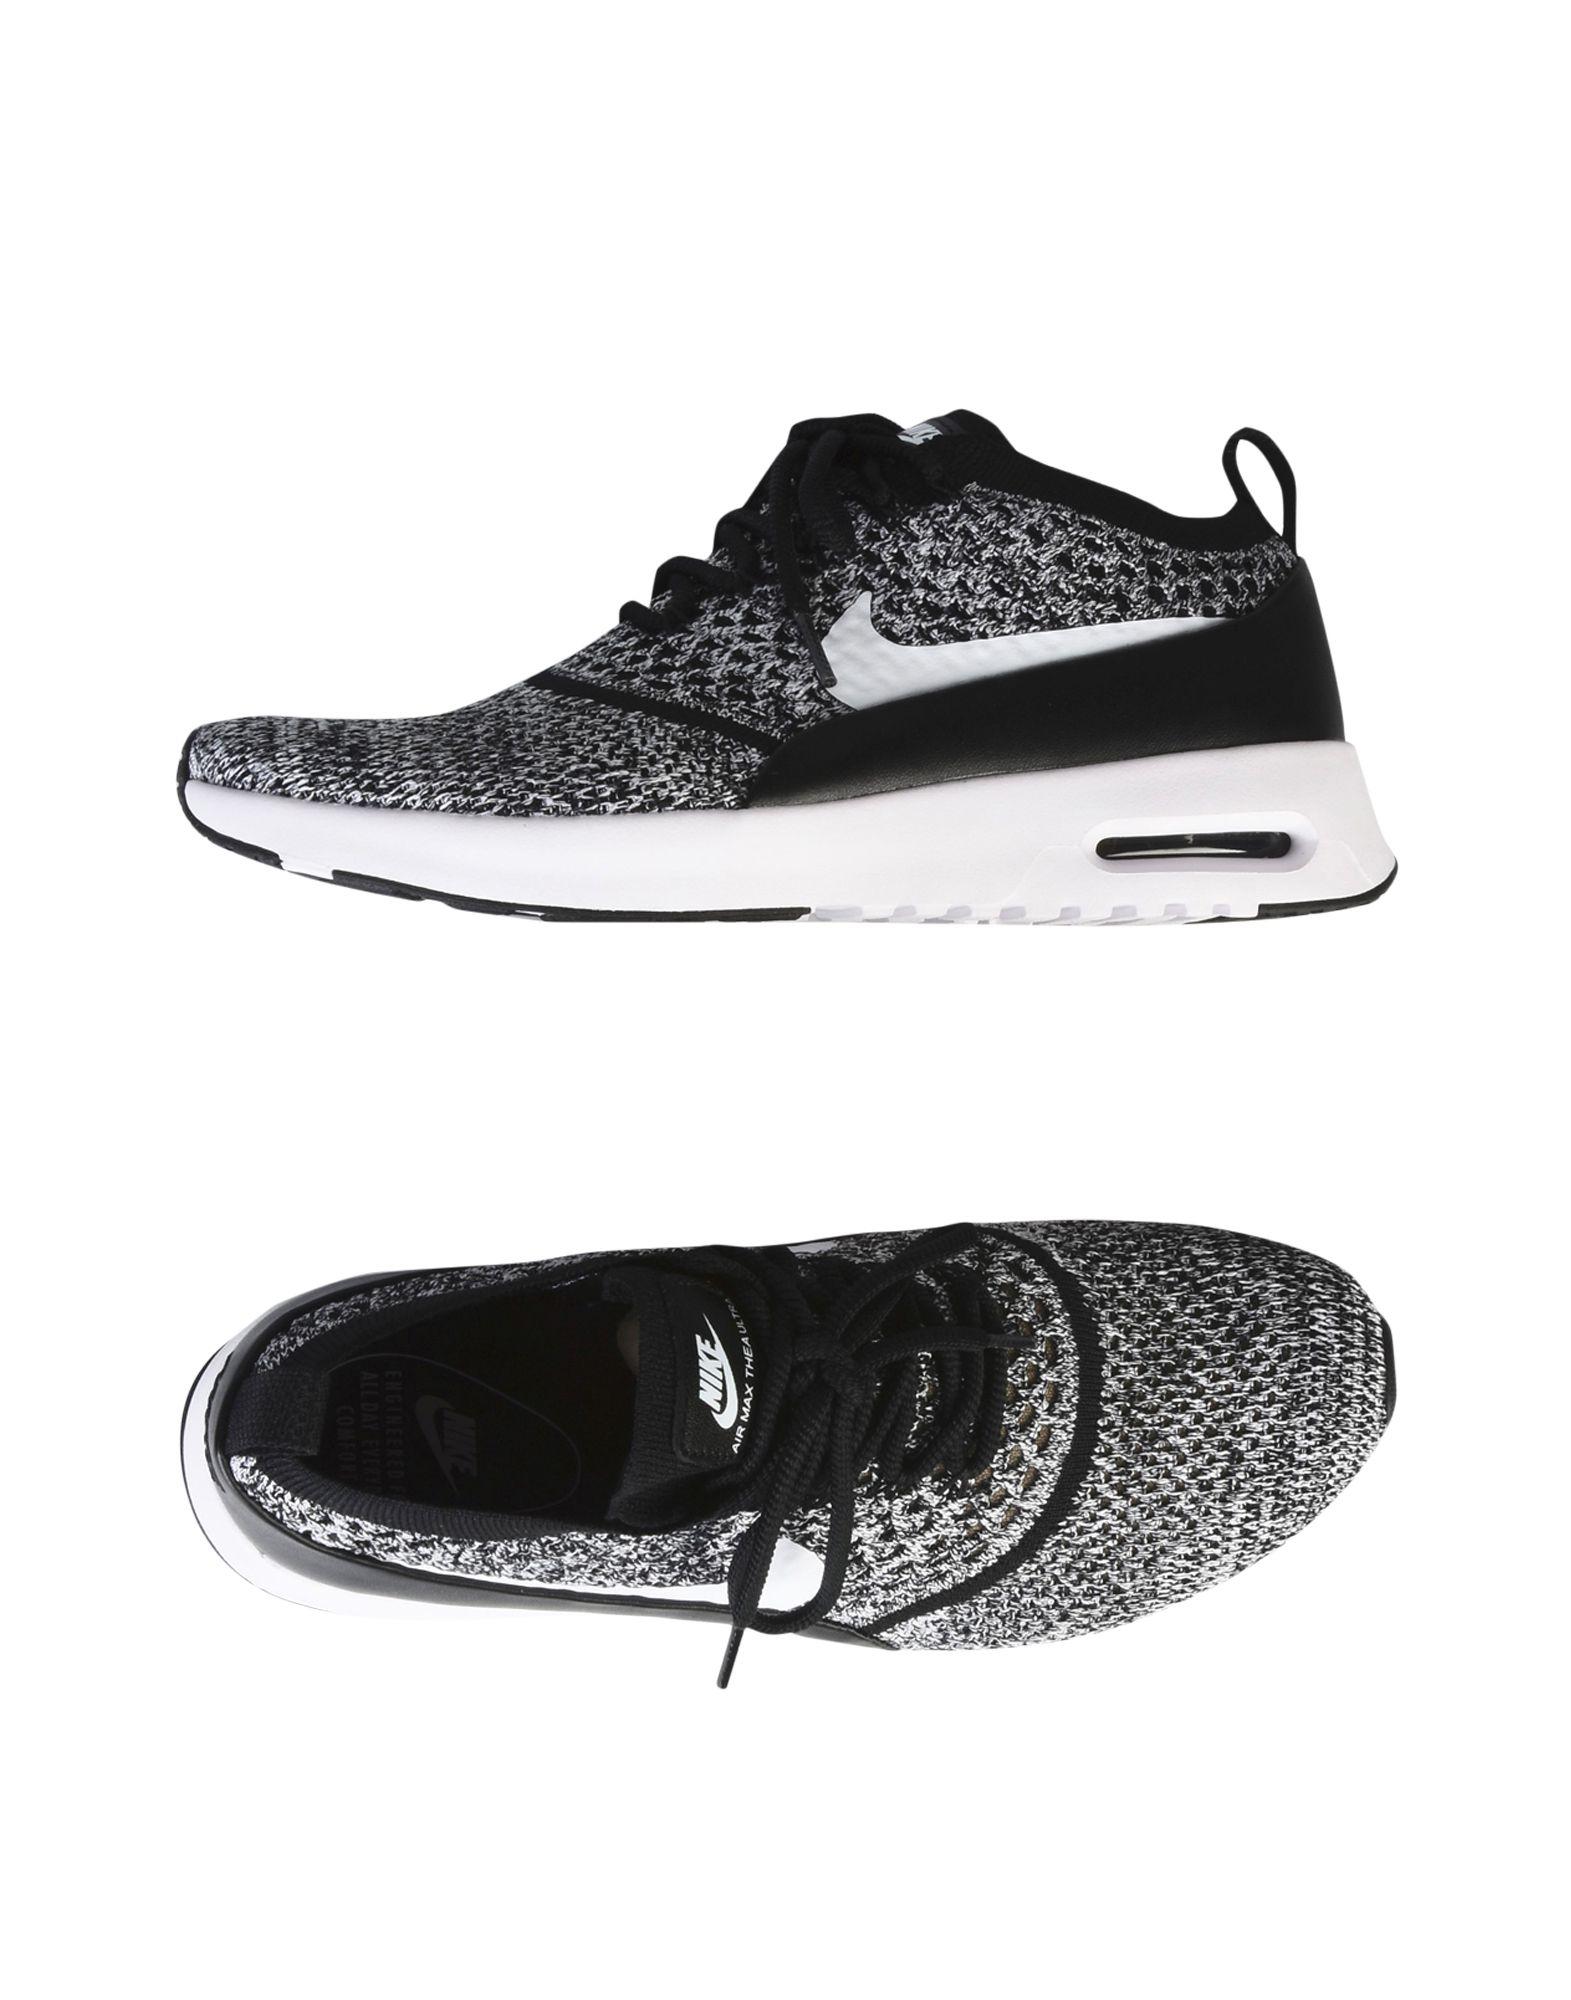 NIKE Damen Low Sneakers & Tennisschuhe Farbe Schwarz Größe 9 jetztbilligerkaufen